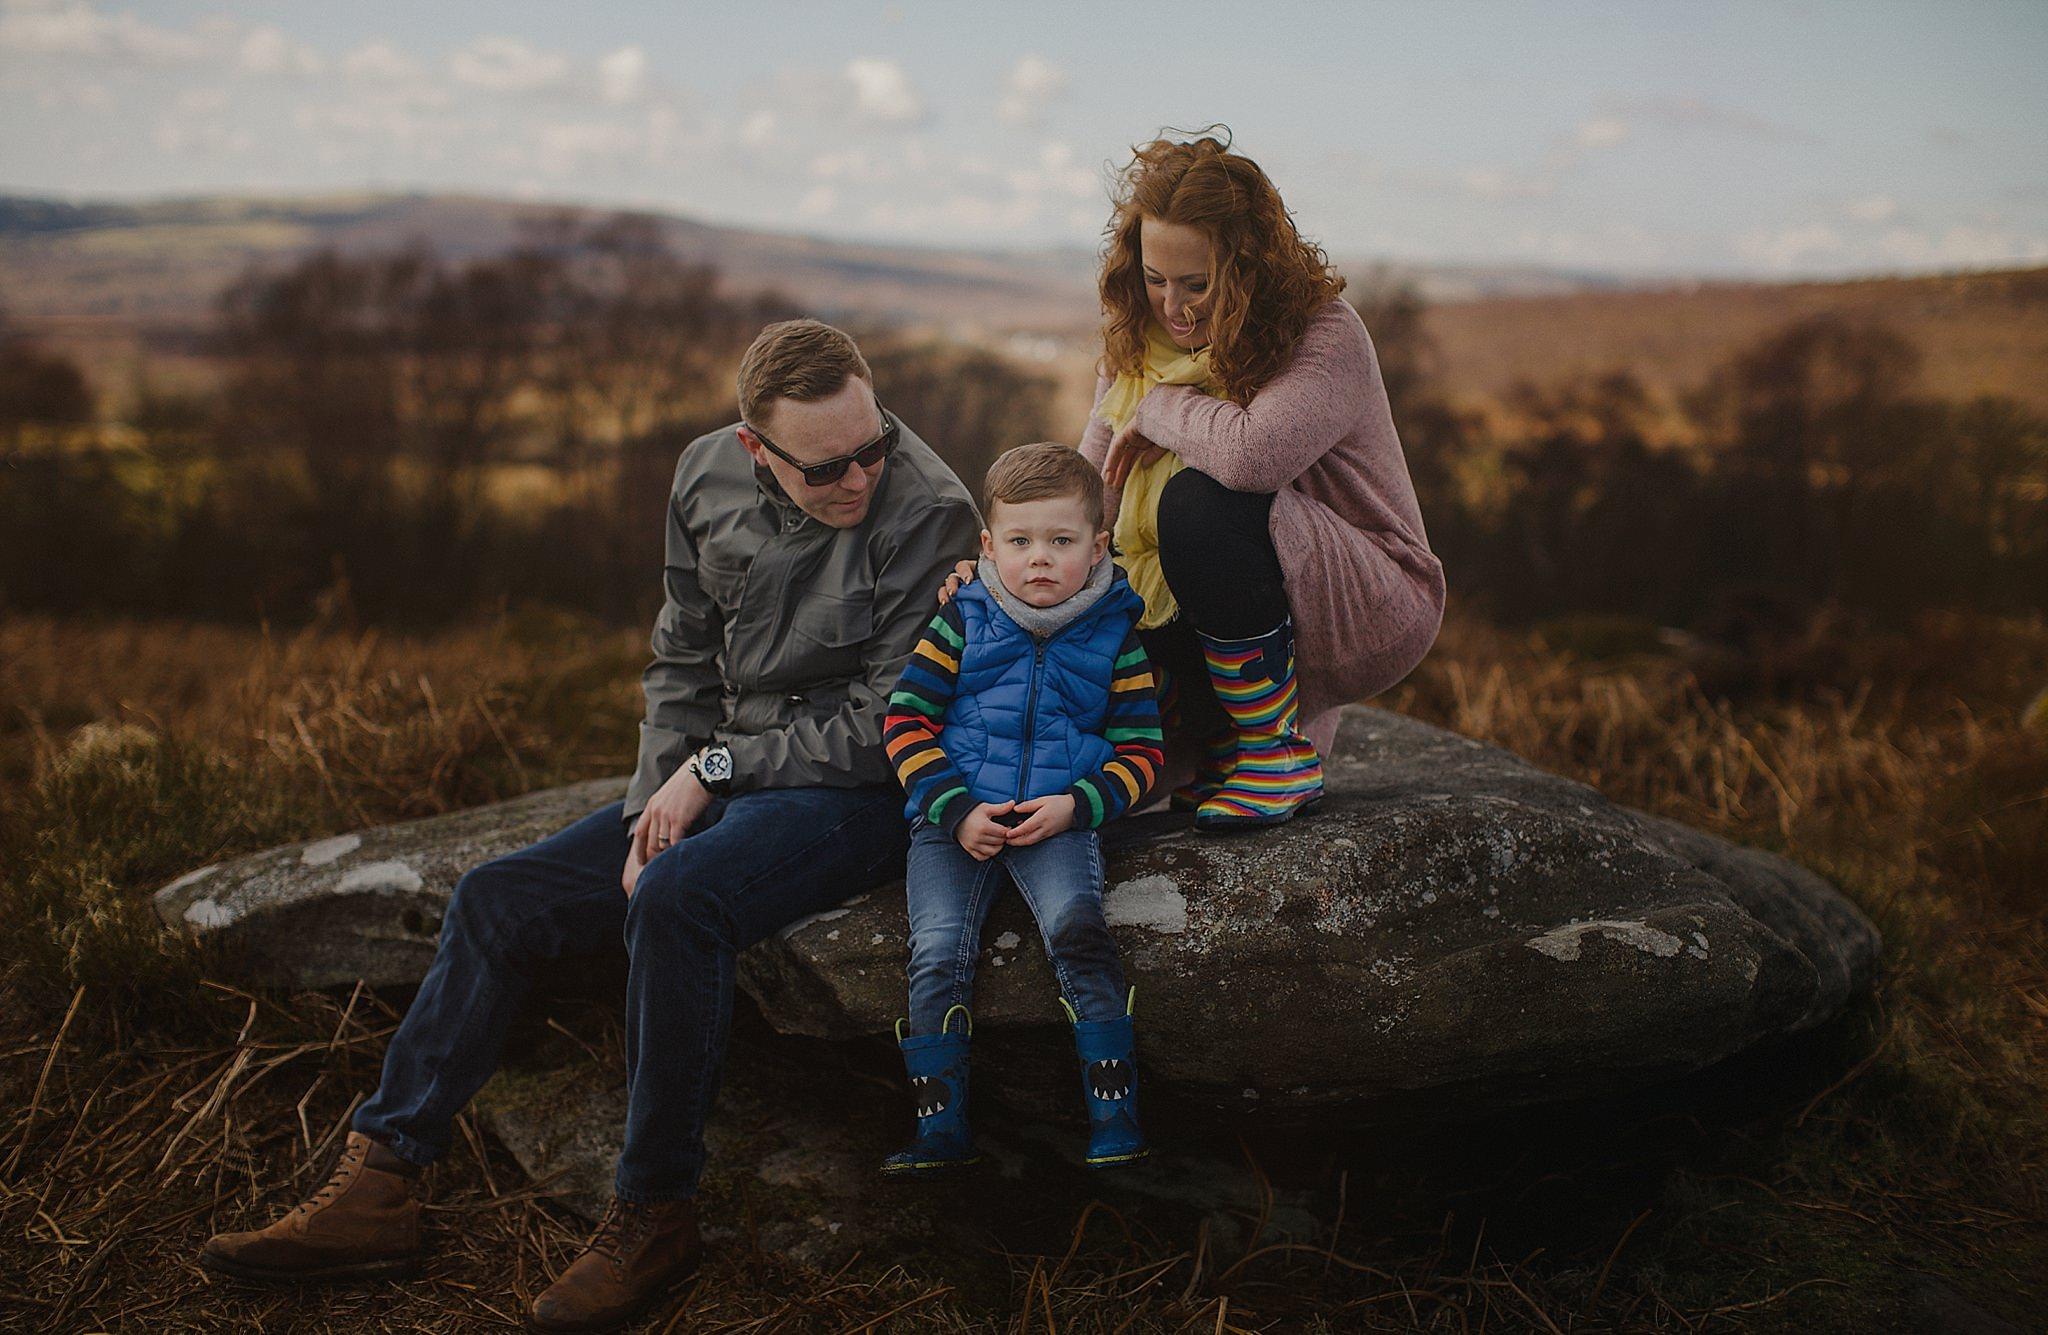 Family_Photography_Sheffield_0001.jpg